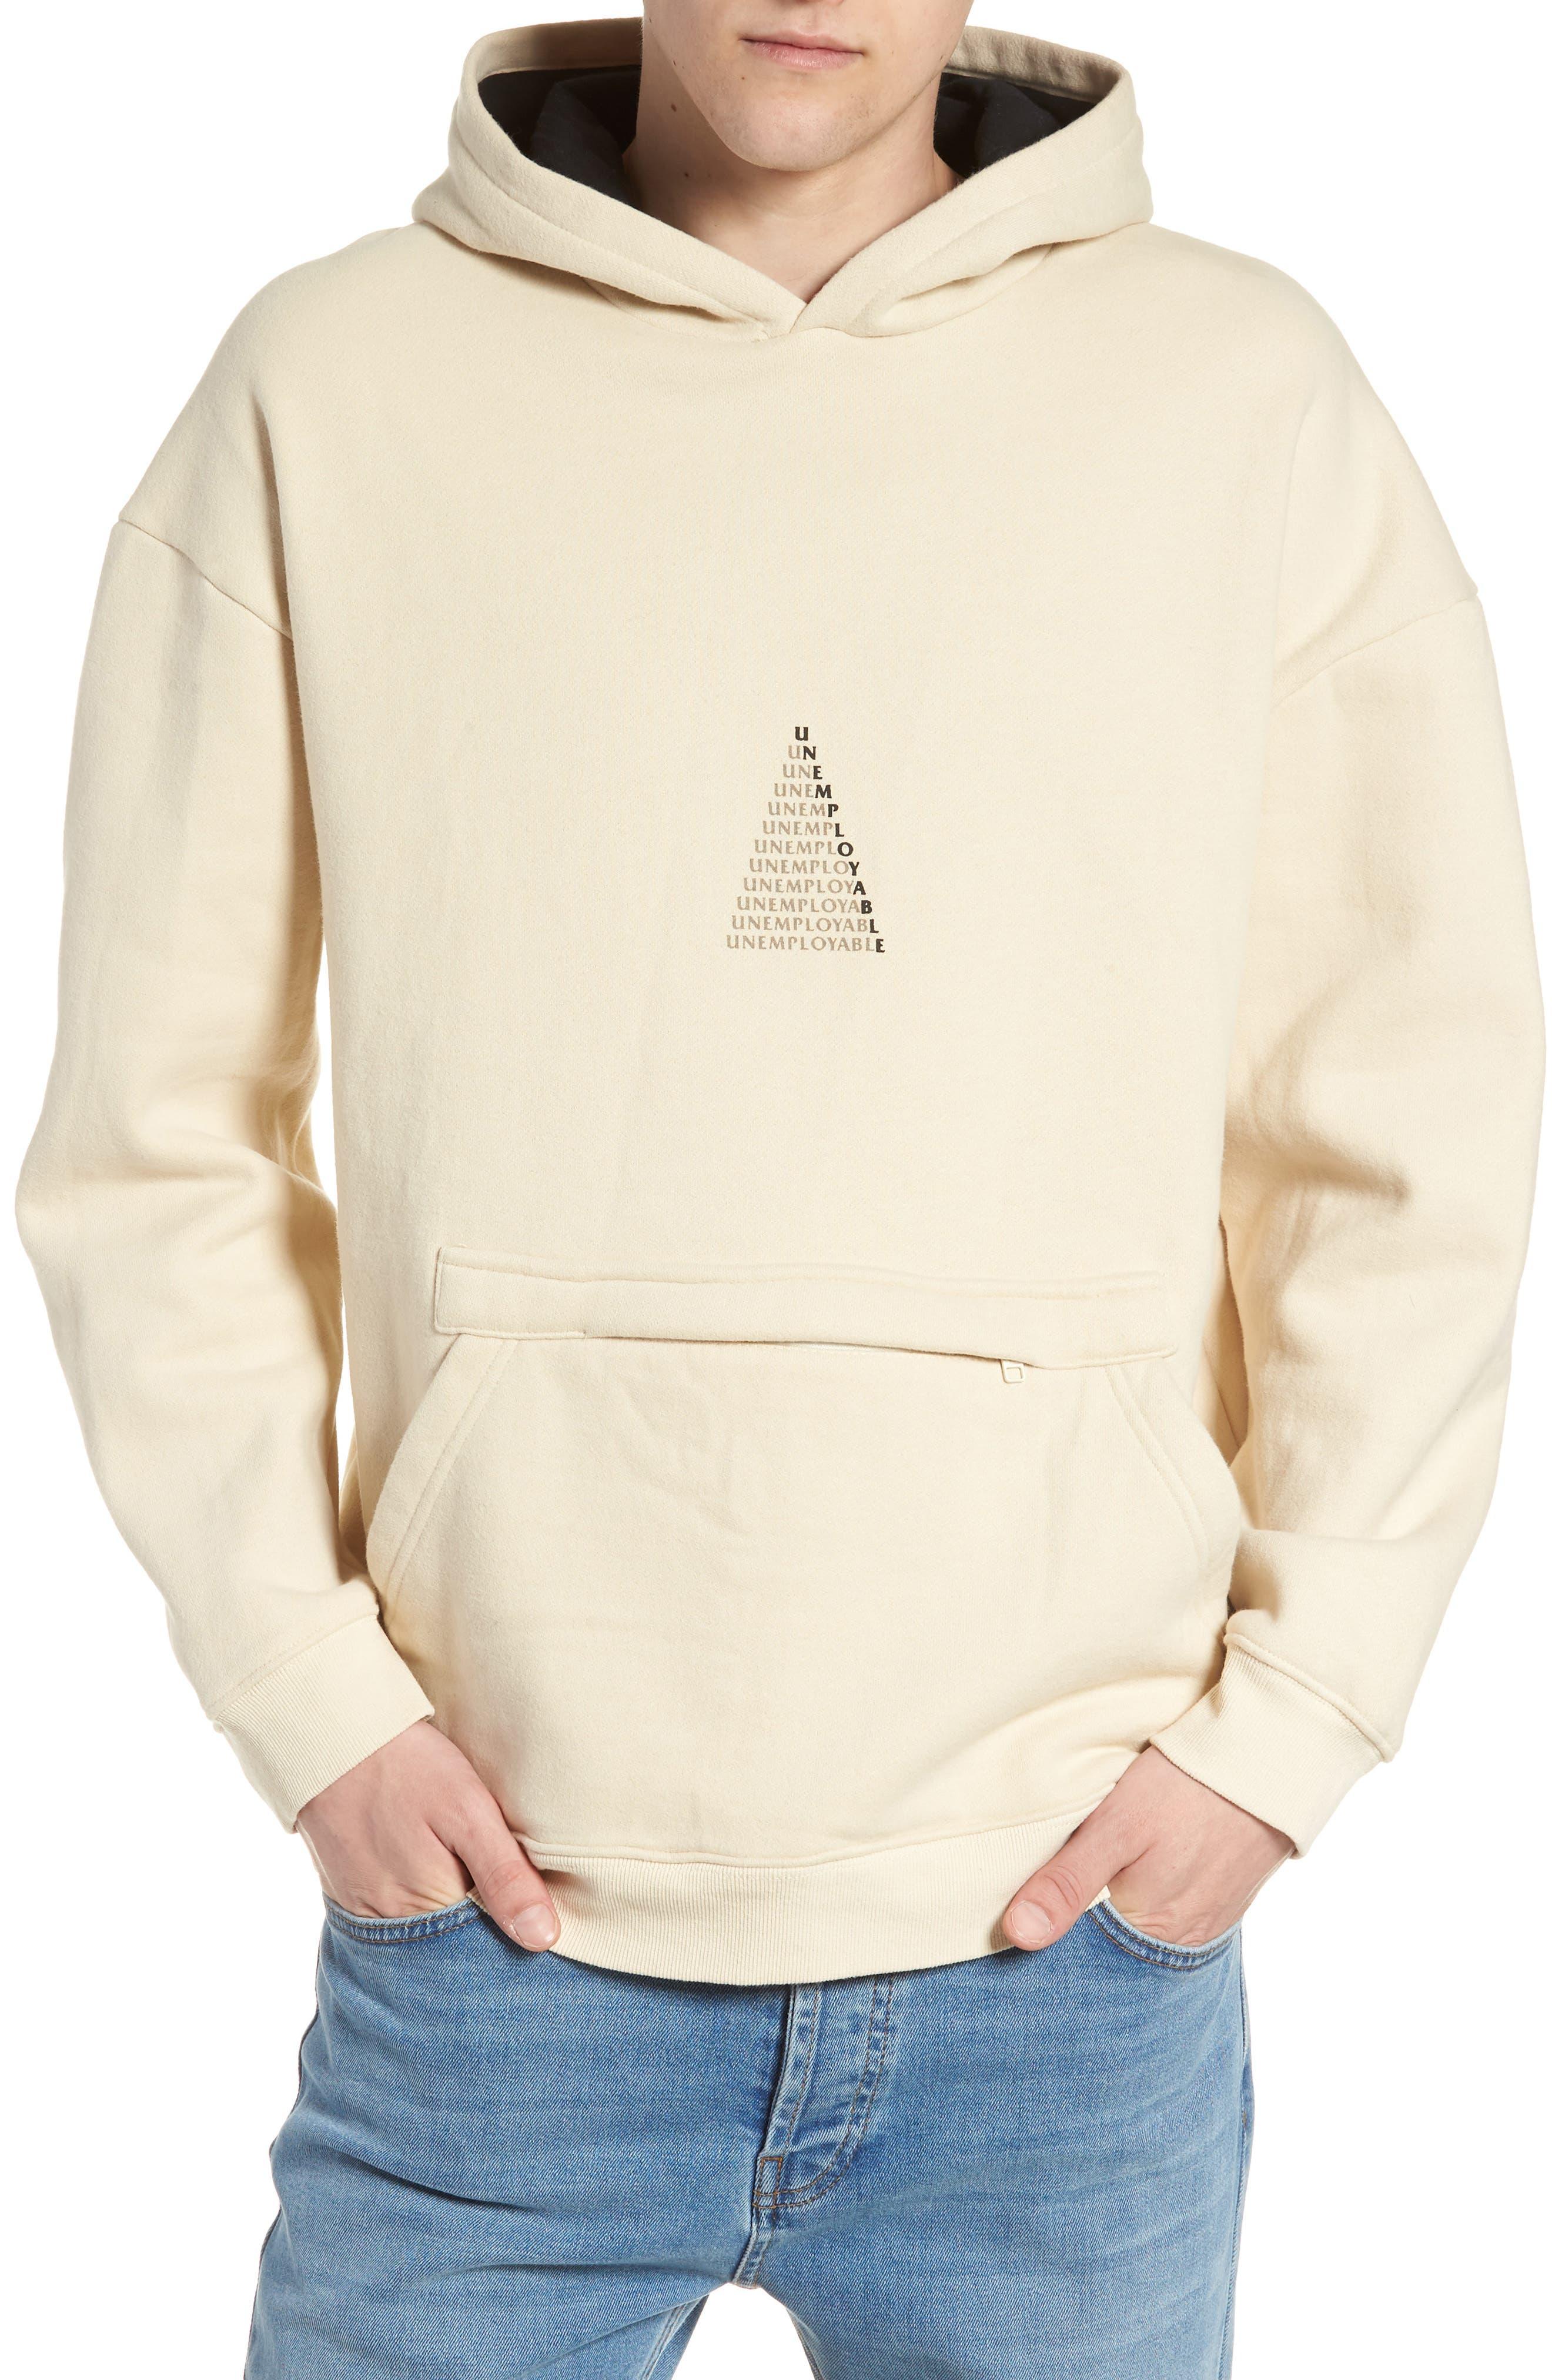 UE Pyramid Hoodie,                             Main thumbnail 1, color,                             MILKY